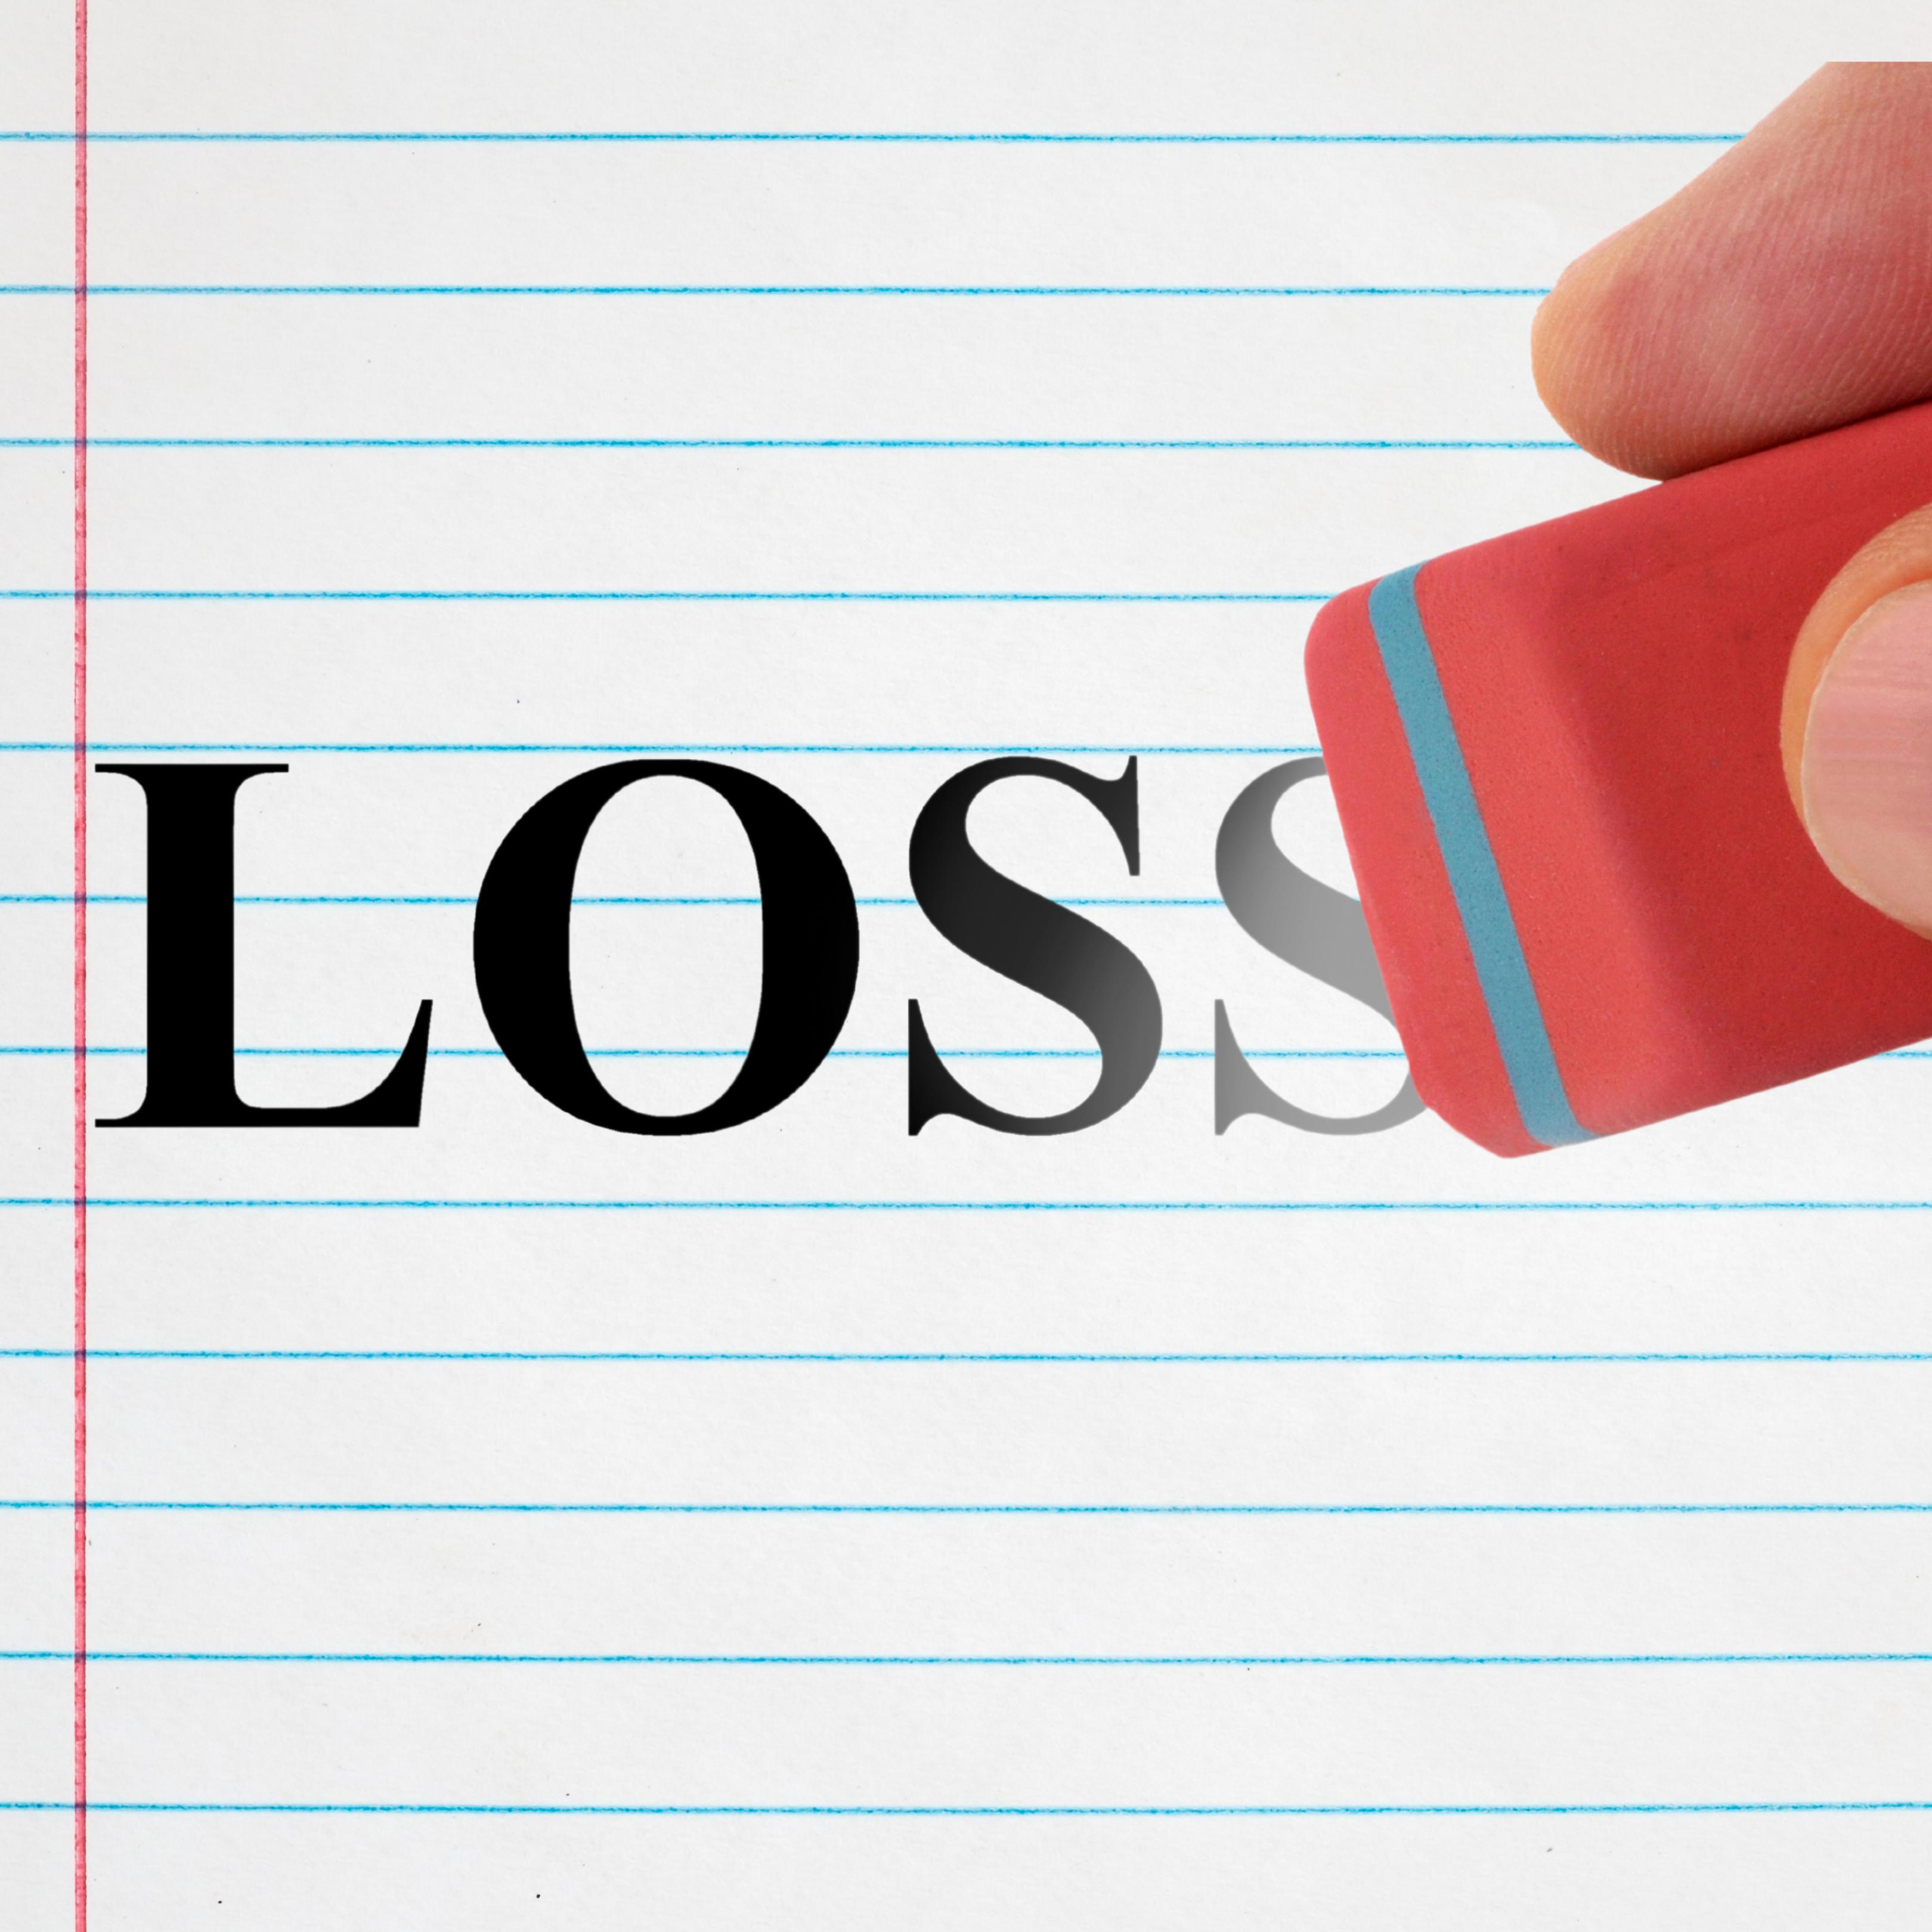 Content Ideas To Advertise On TikTok - Loss Aversion